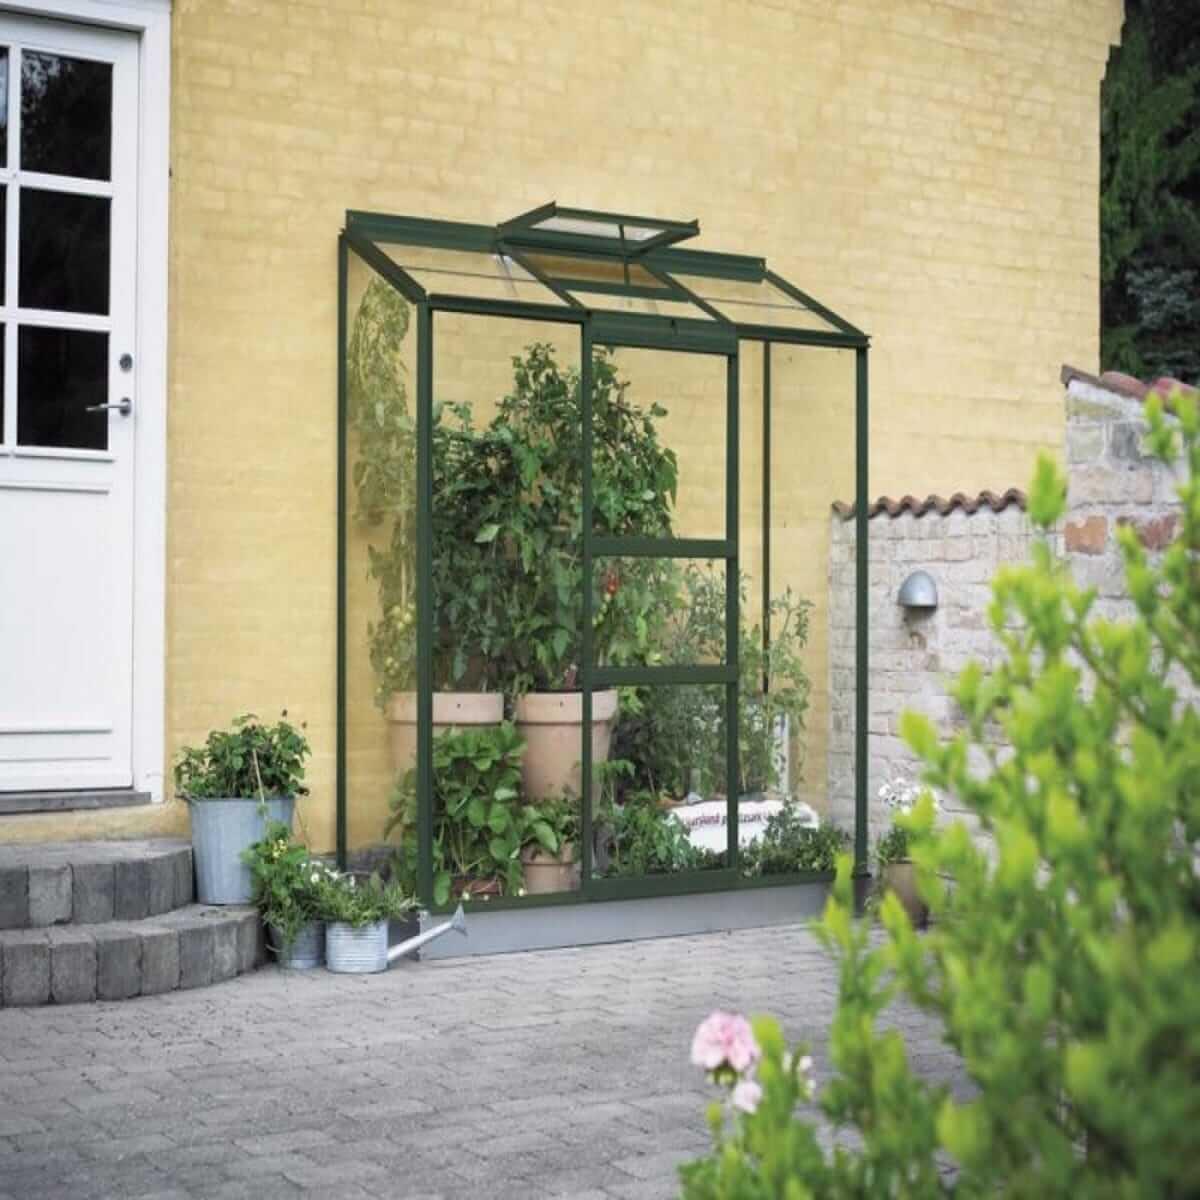 Halls Växthus Altan 3 1,3 kvm Grön Glas